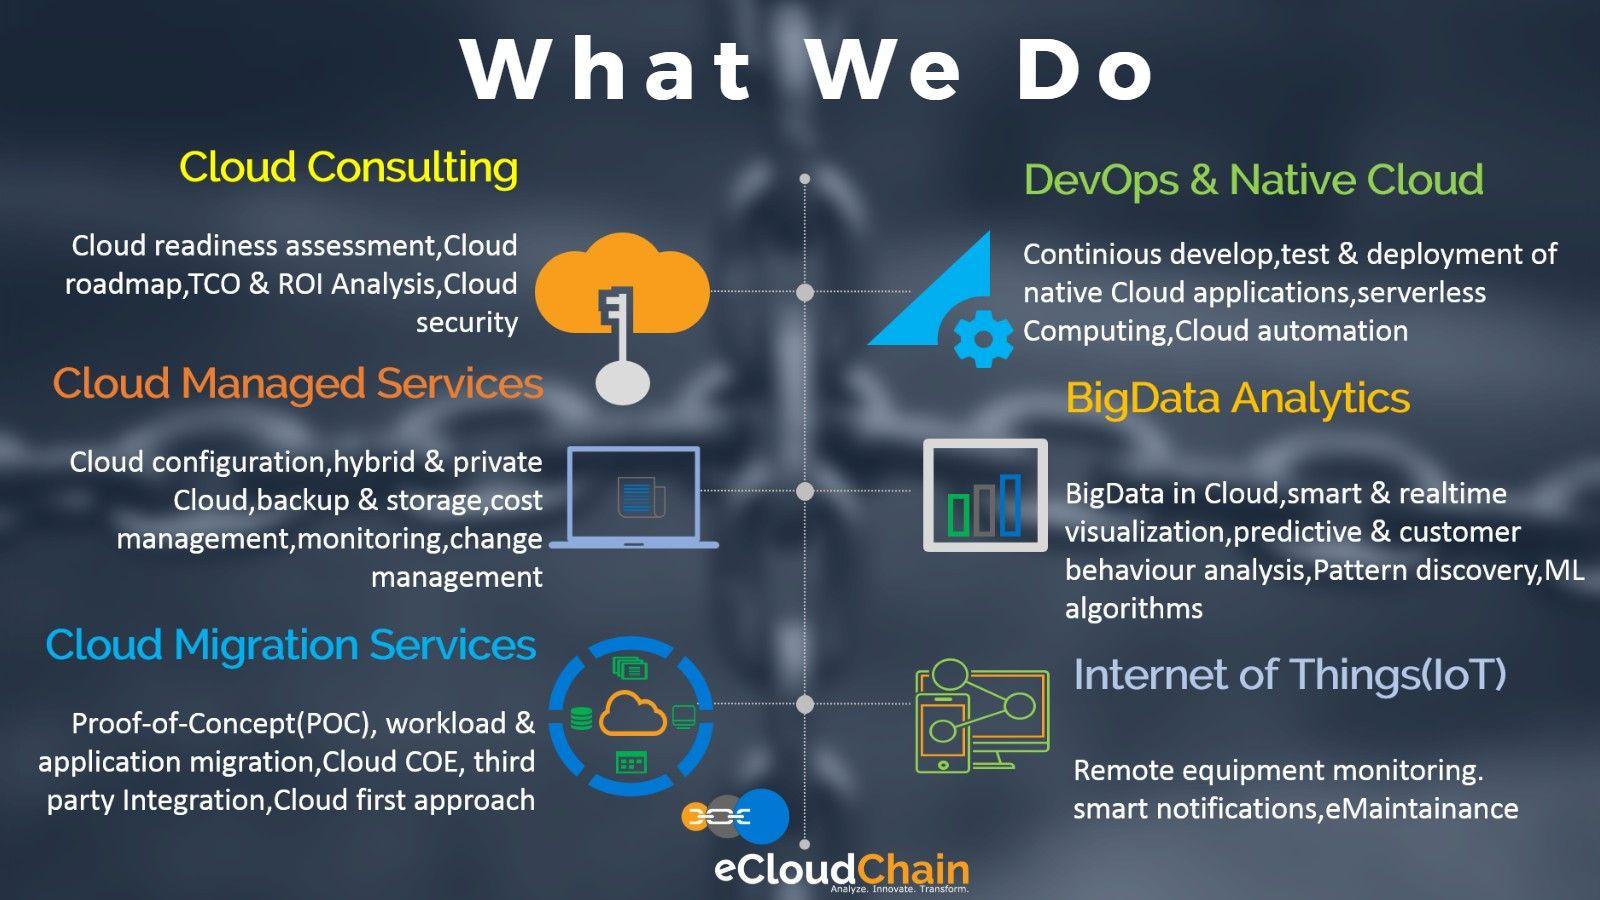 Pin By Ecloudchain On Ecloudchain Cloud Computing Services Cloud Infrastructure Digital Transformation